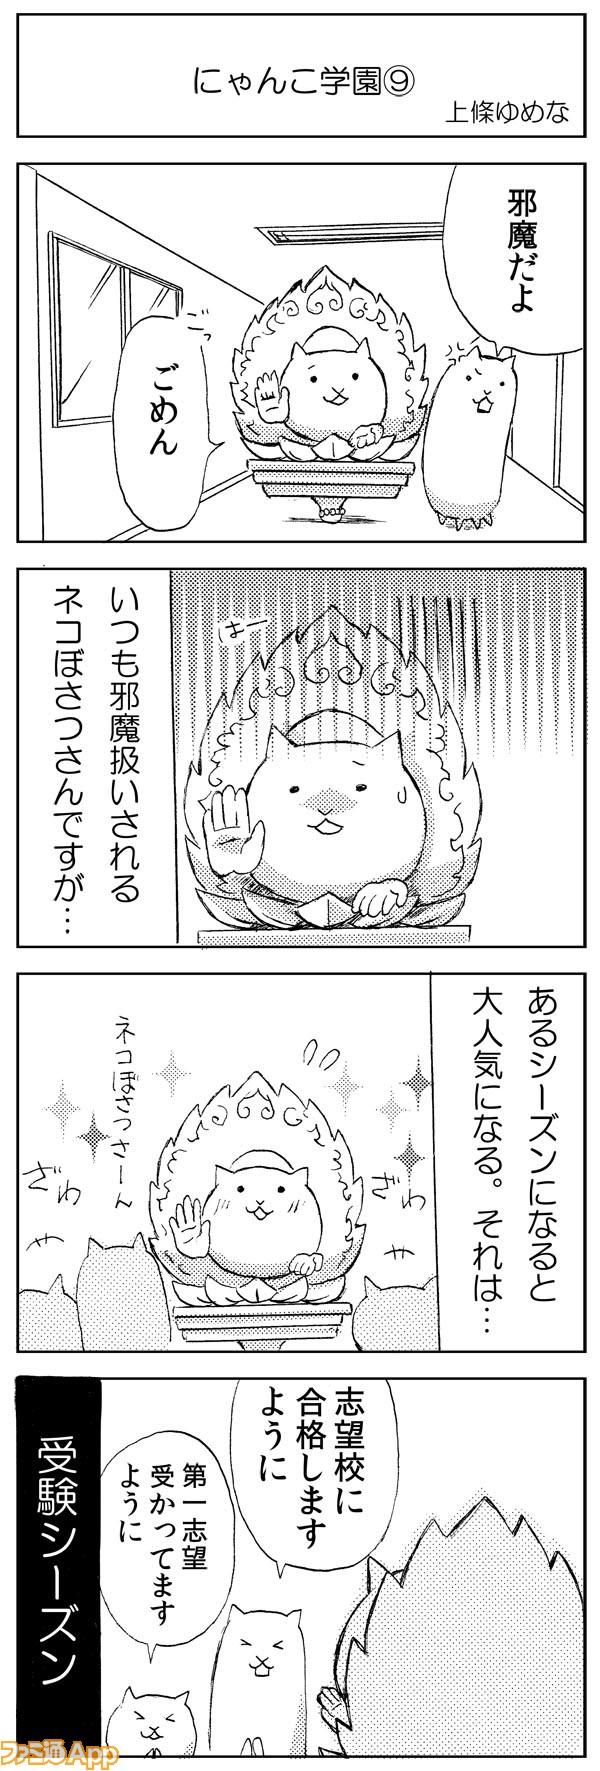 03kami_065